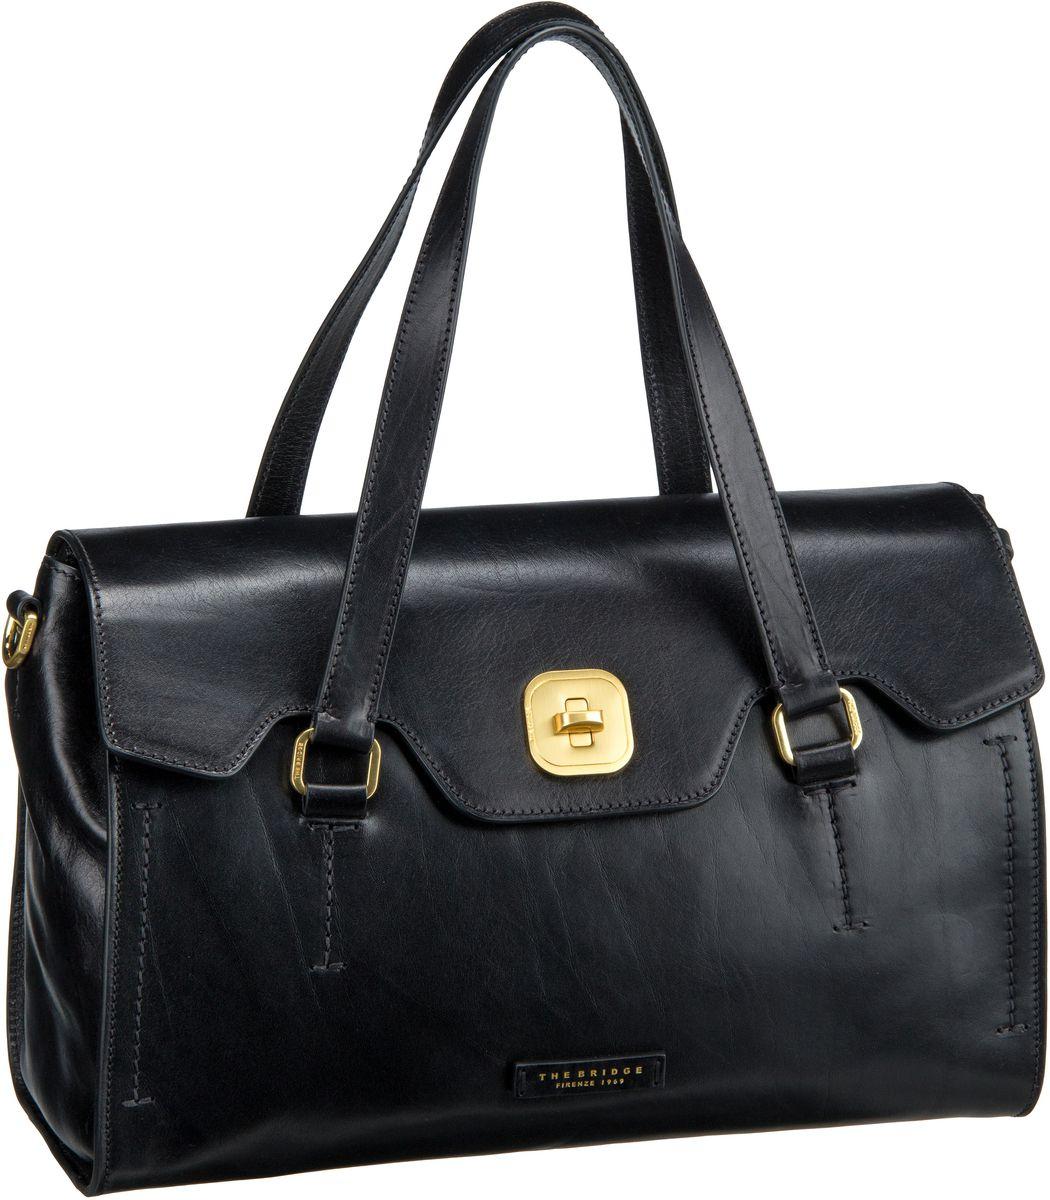 Handtasche Hornby Handtasche 2138 Nero (innen: Rot)